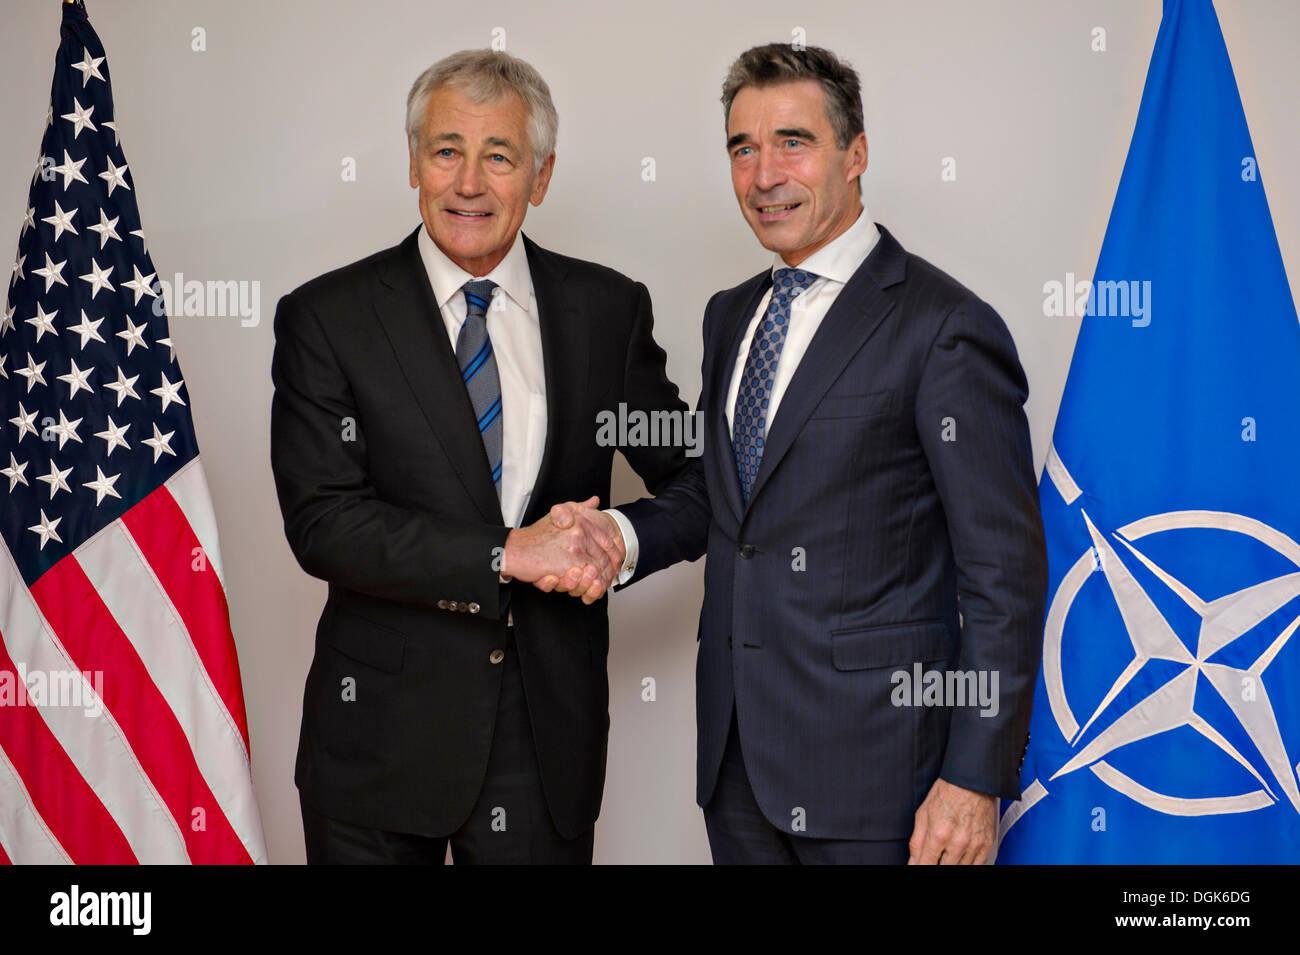 US Secretary of Defense Chuck Hagel meets with NATO Secretary General Anders Fogh Rasmussen October 22, 2013 in Stock Photo